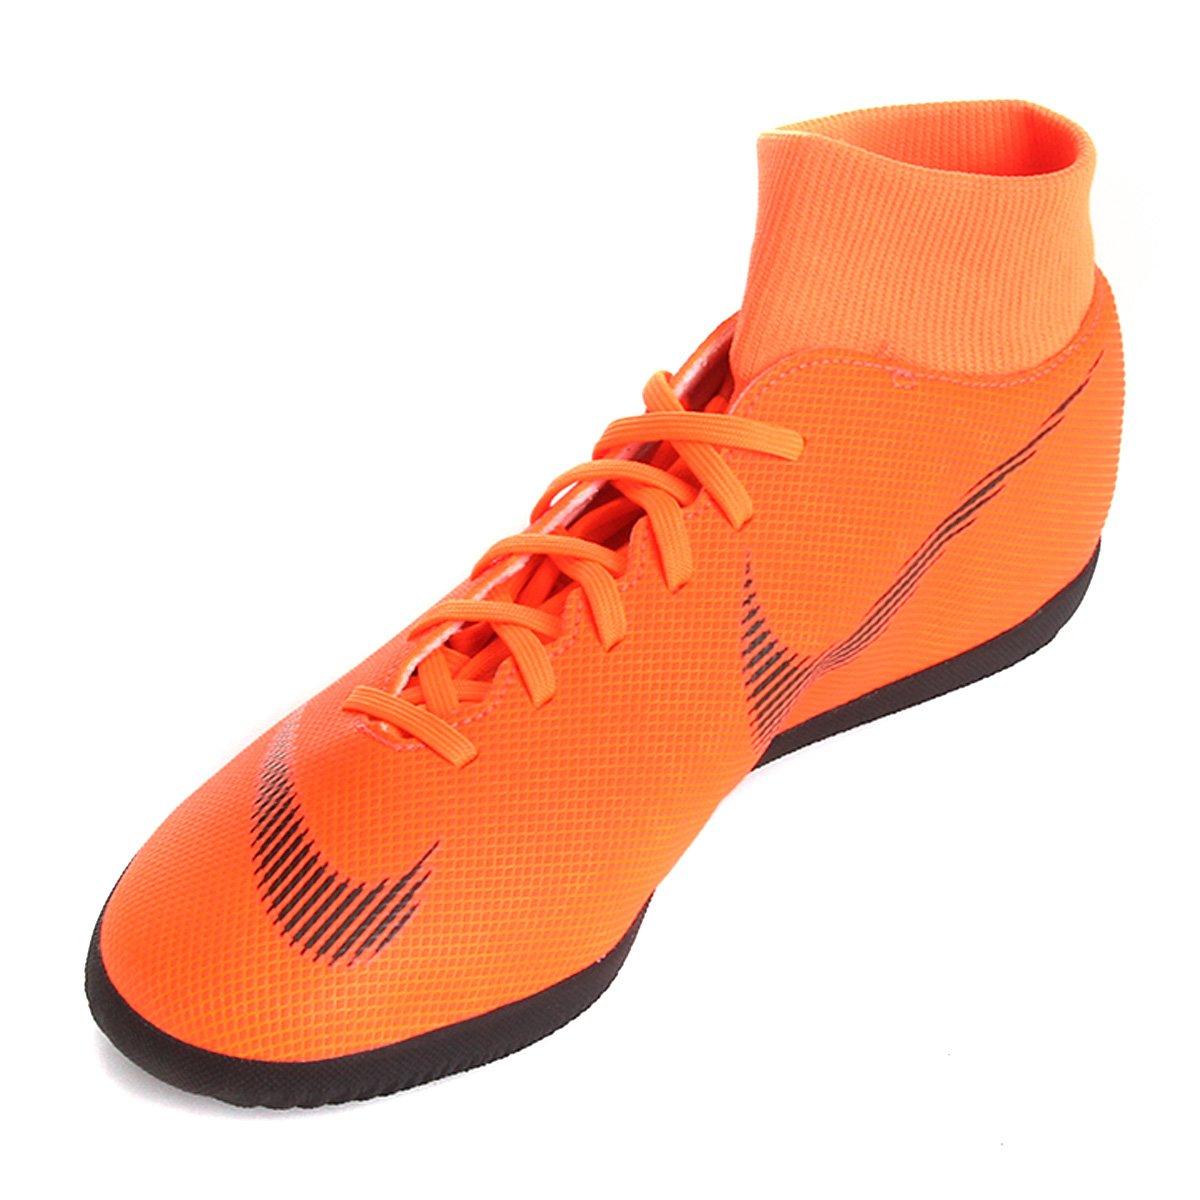 ... shop chuteira futsal nike mercurial superfly 6 club masculina 41954  89943 2cd279e81b234